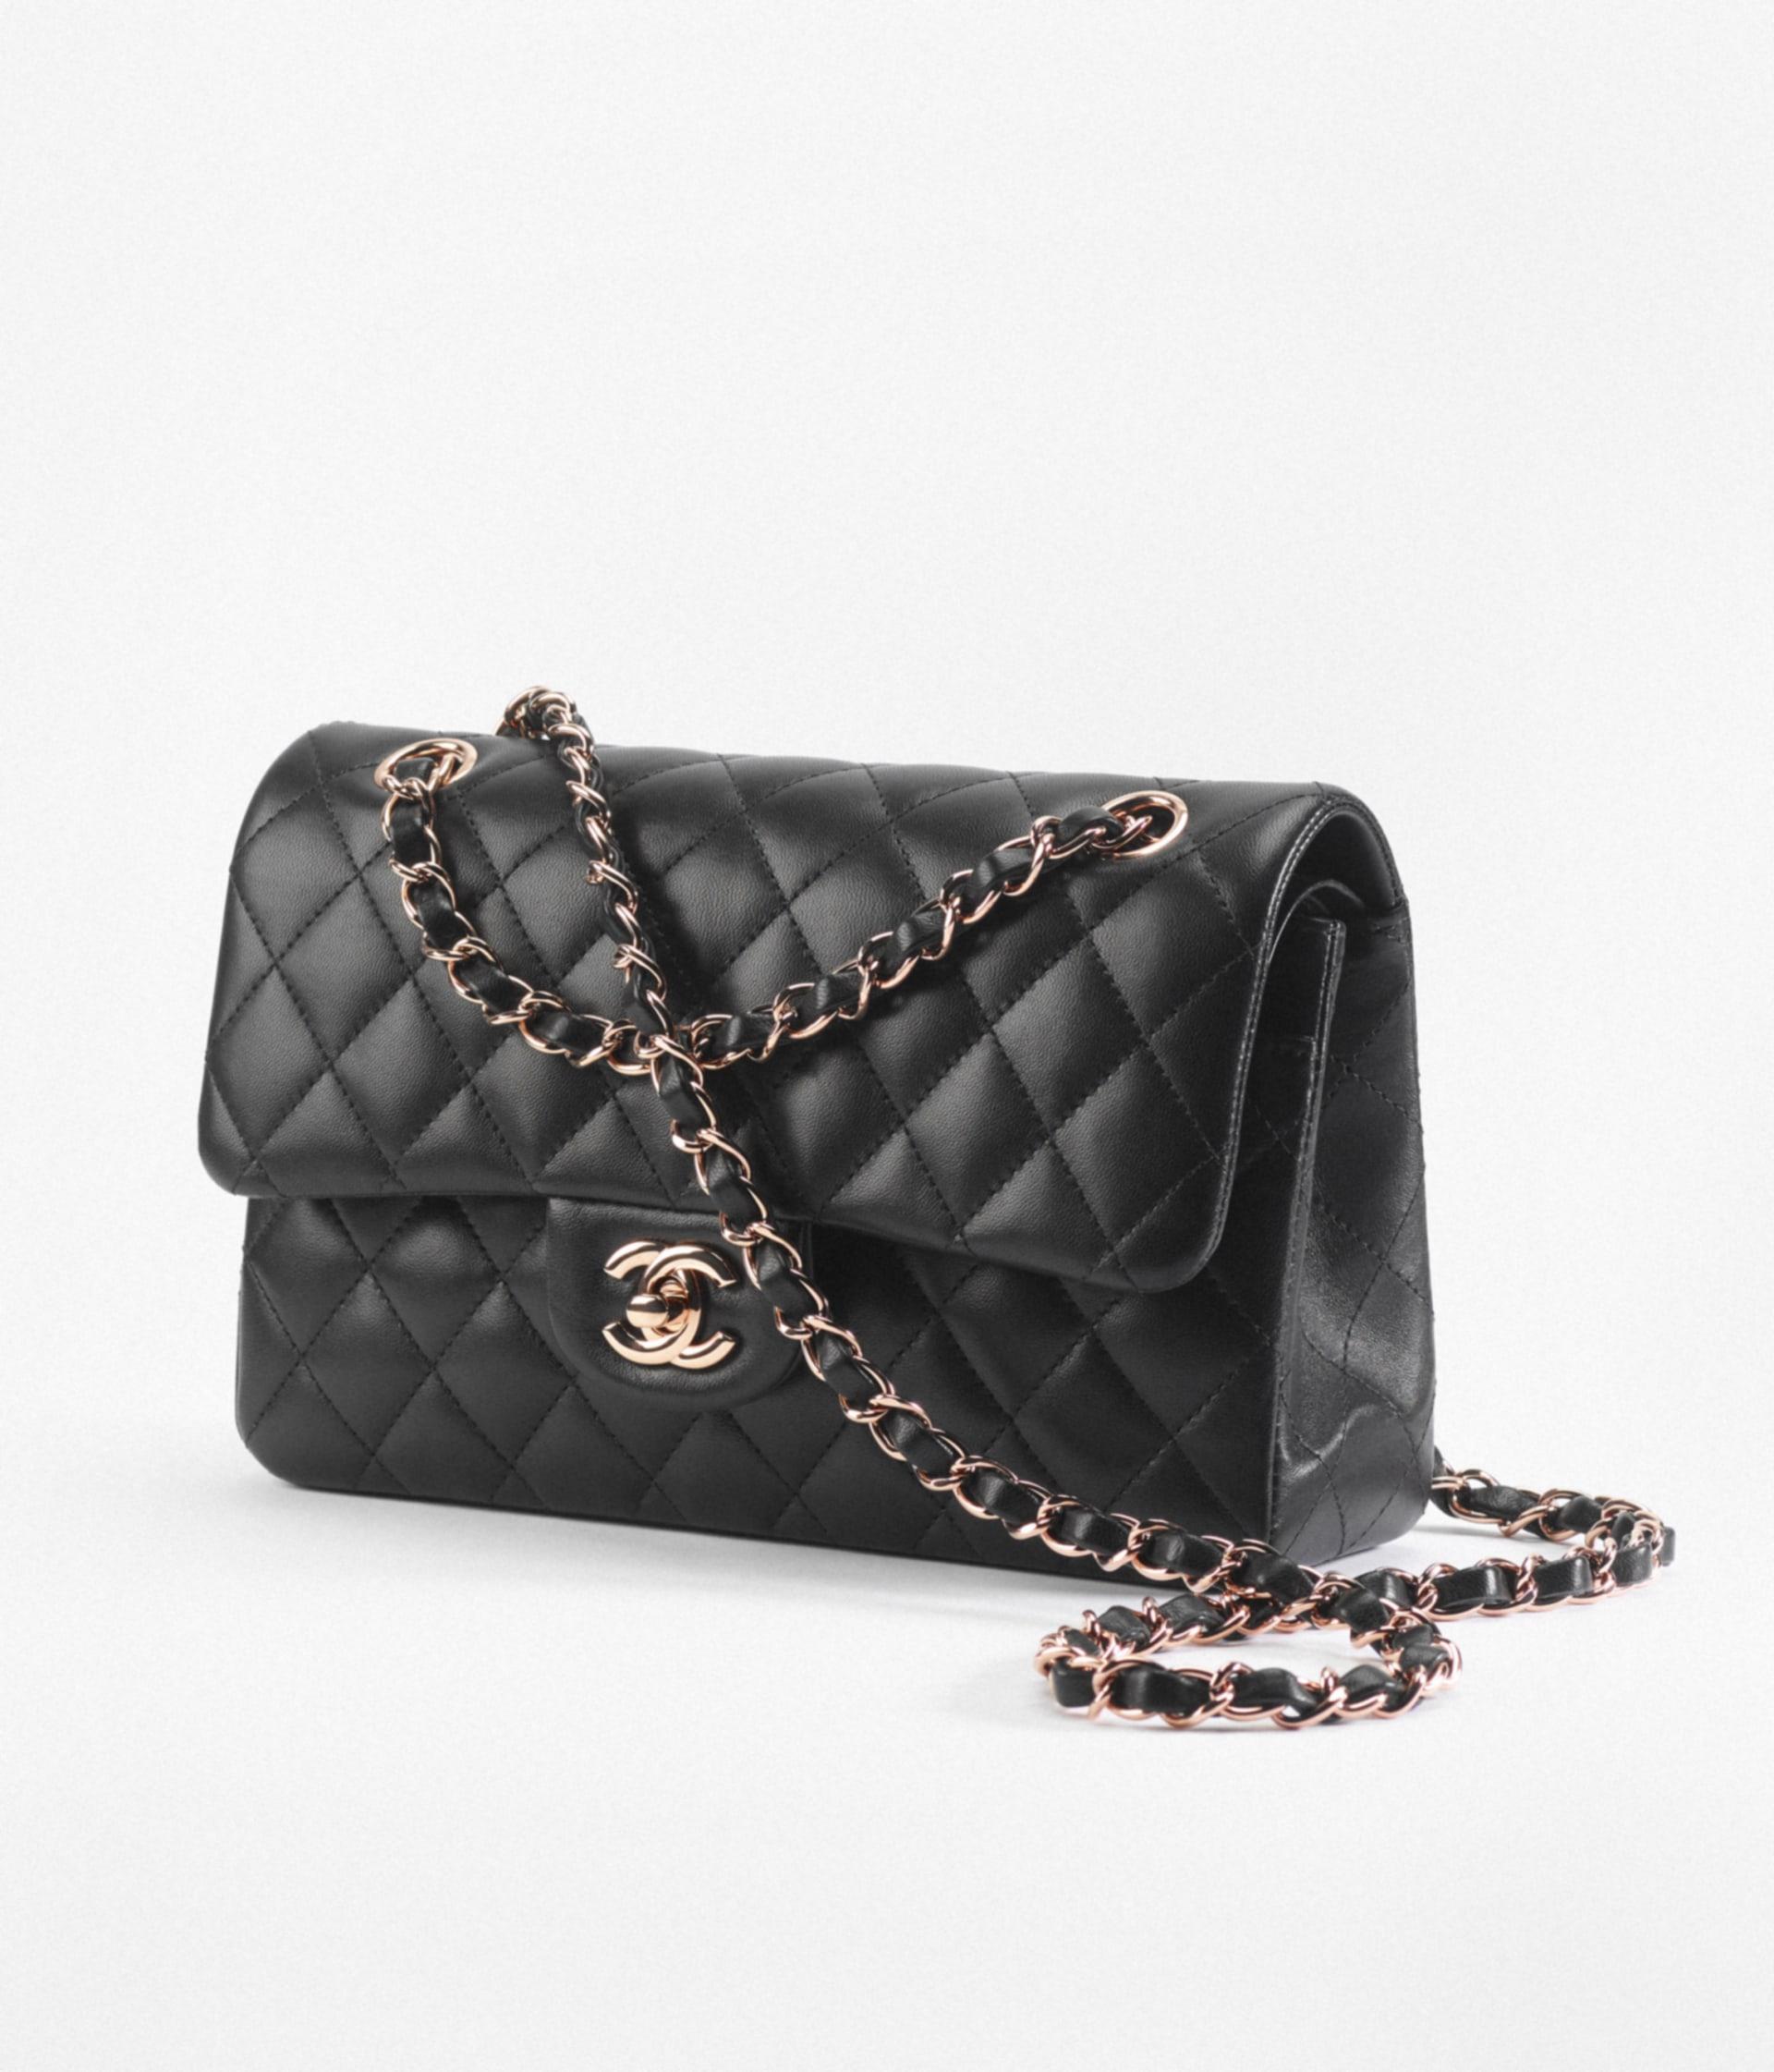 image 2 - Small Classic Handbag - Lambskin & Pink Gold-Tone Metal - Black